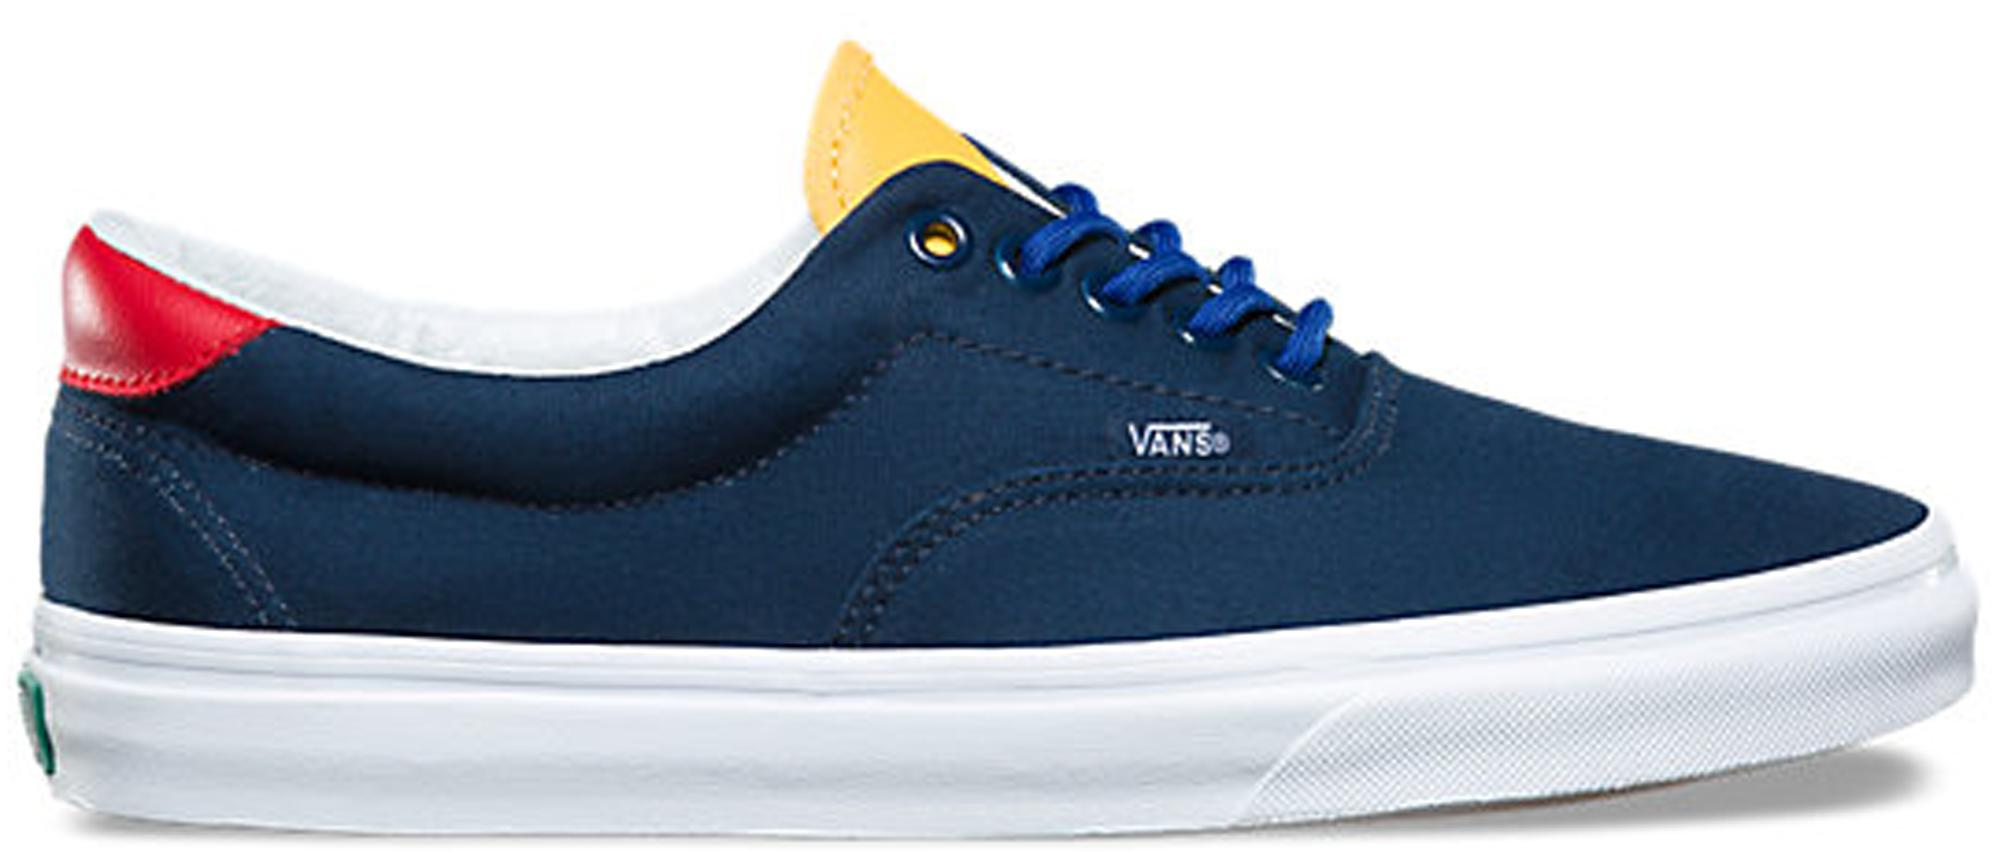 e9490846de Lyst - Vans Era 59 Yacht Club Dress Blues in Blue for Men